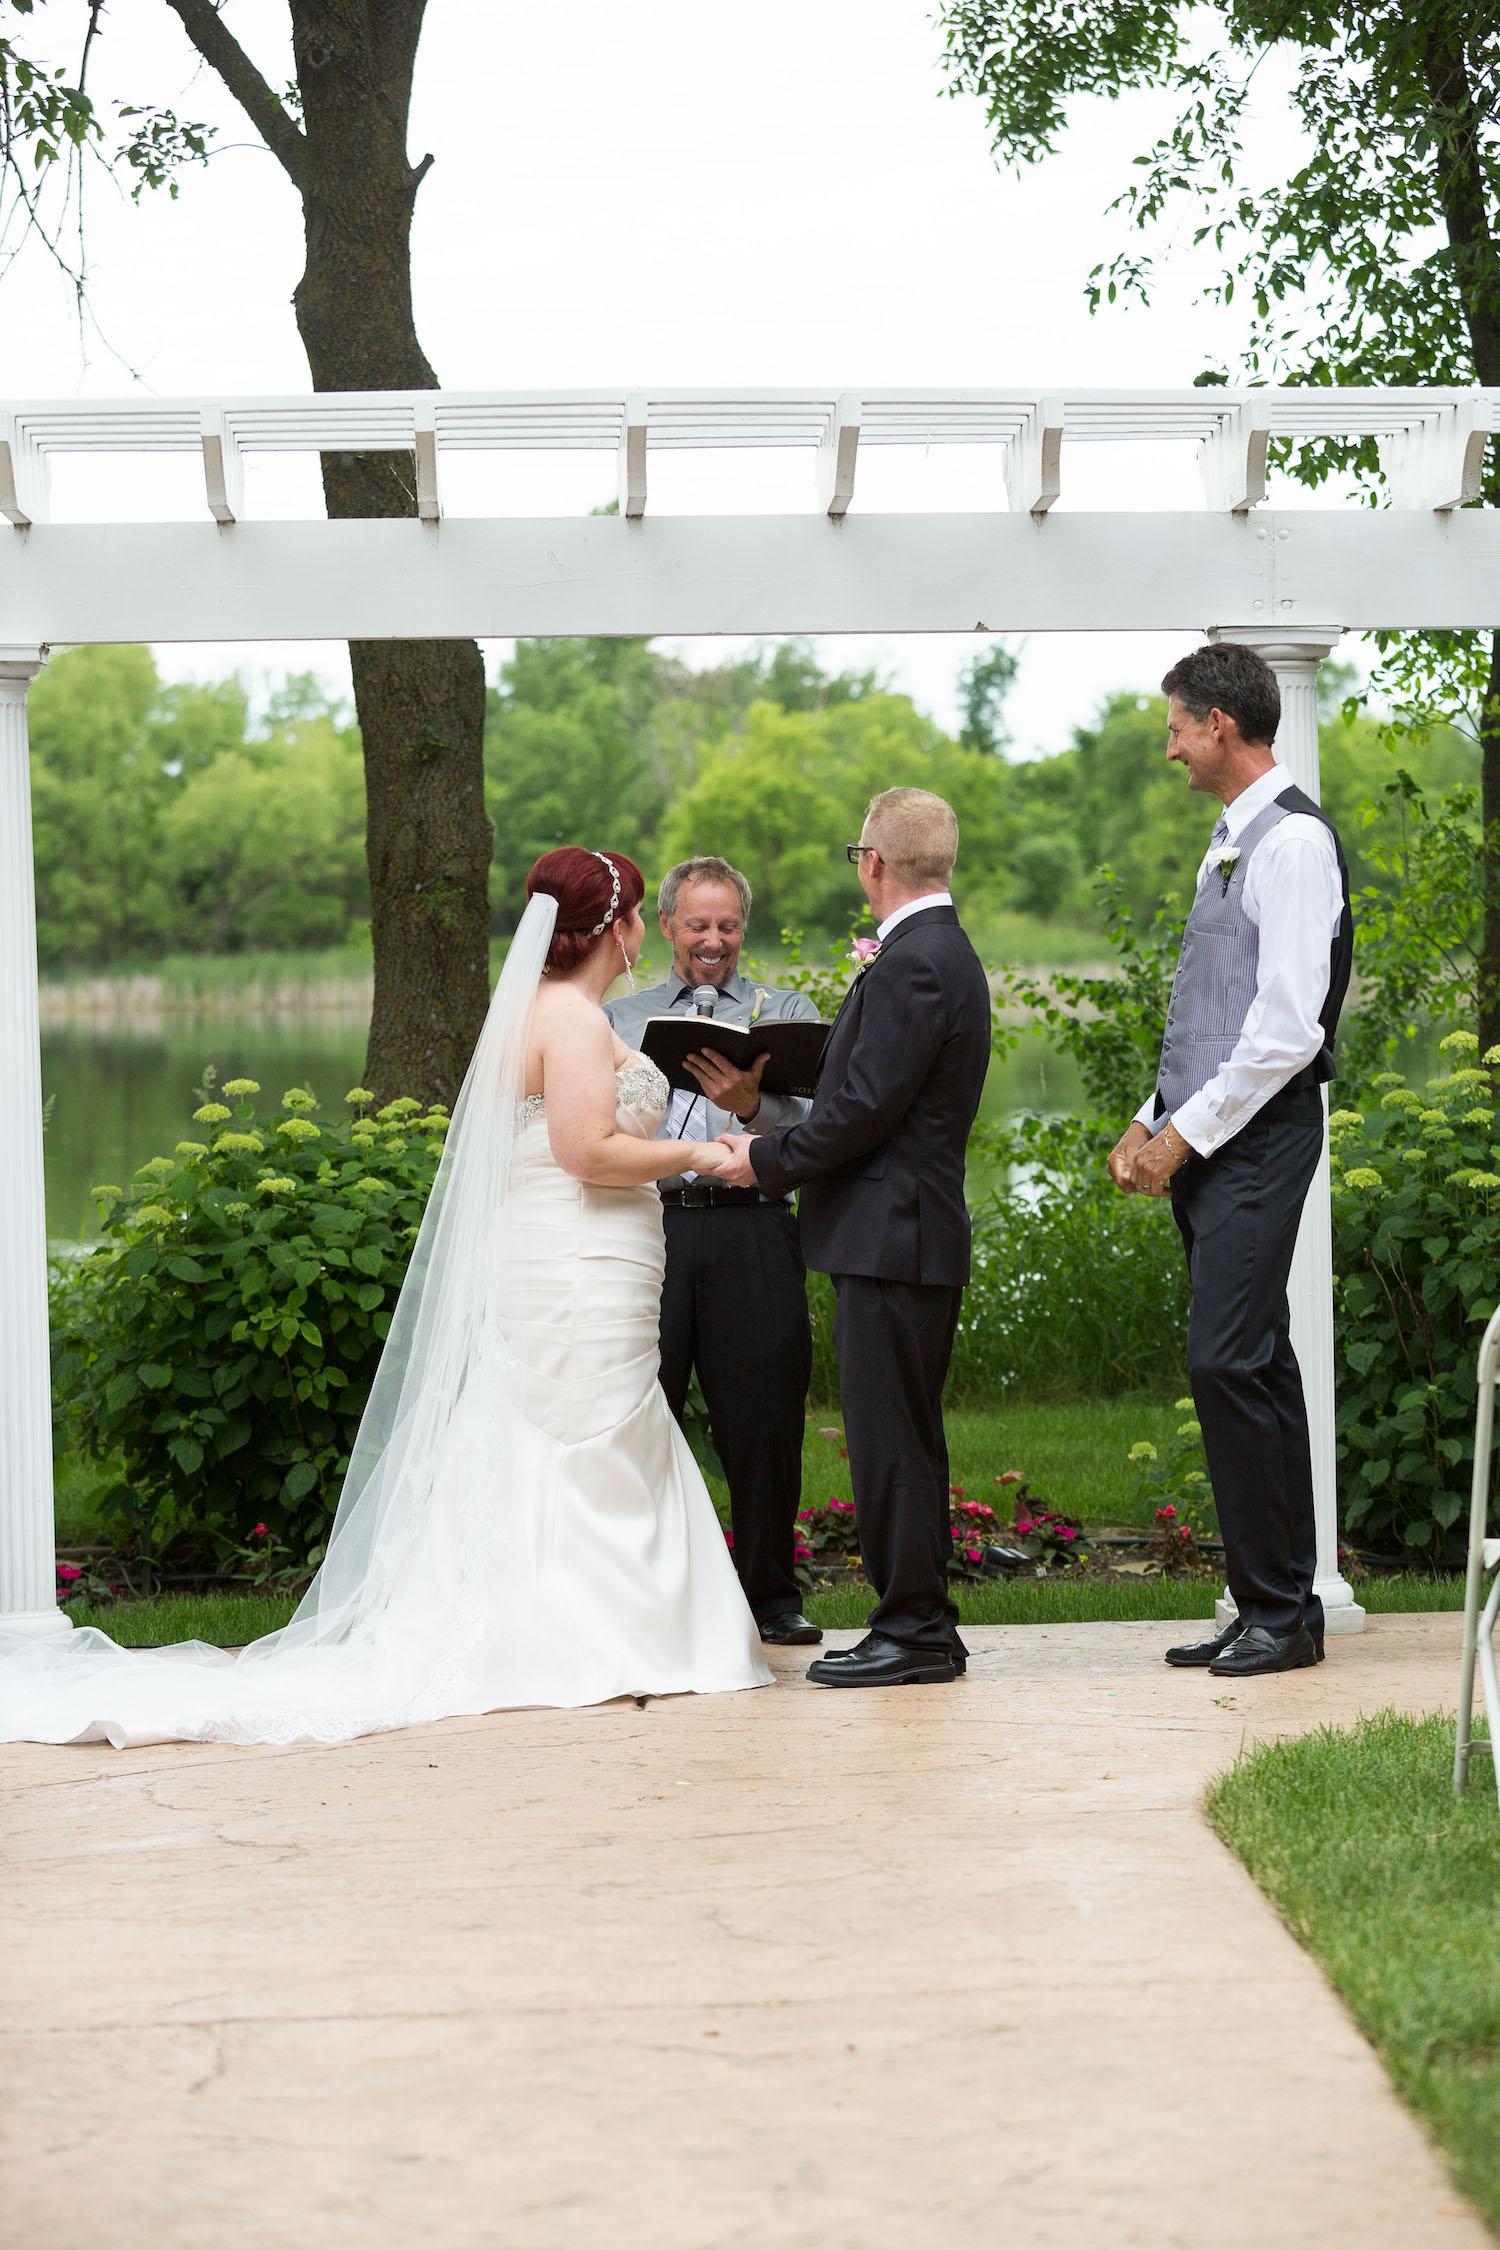 Cindyrella's Garden outdoor ceremony by the lake with a redhead bride,